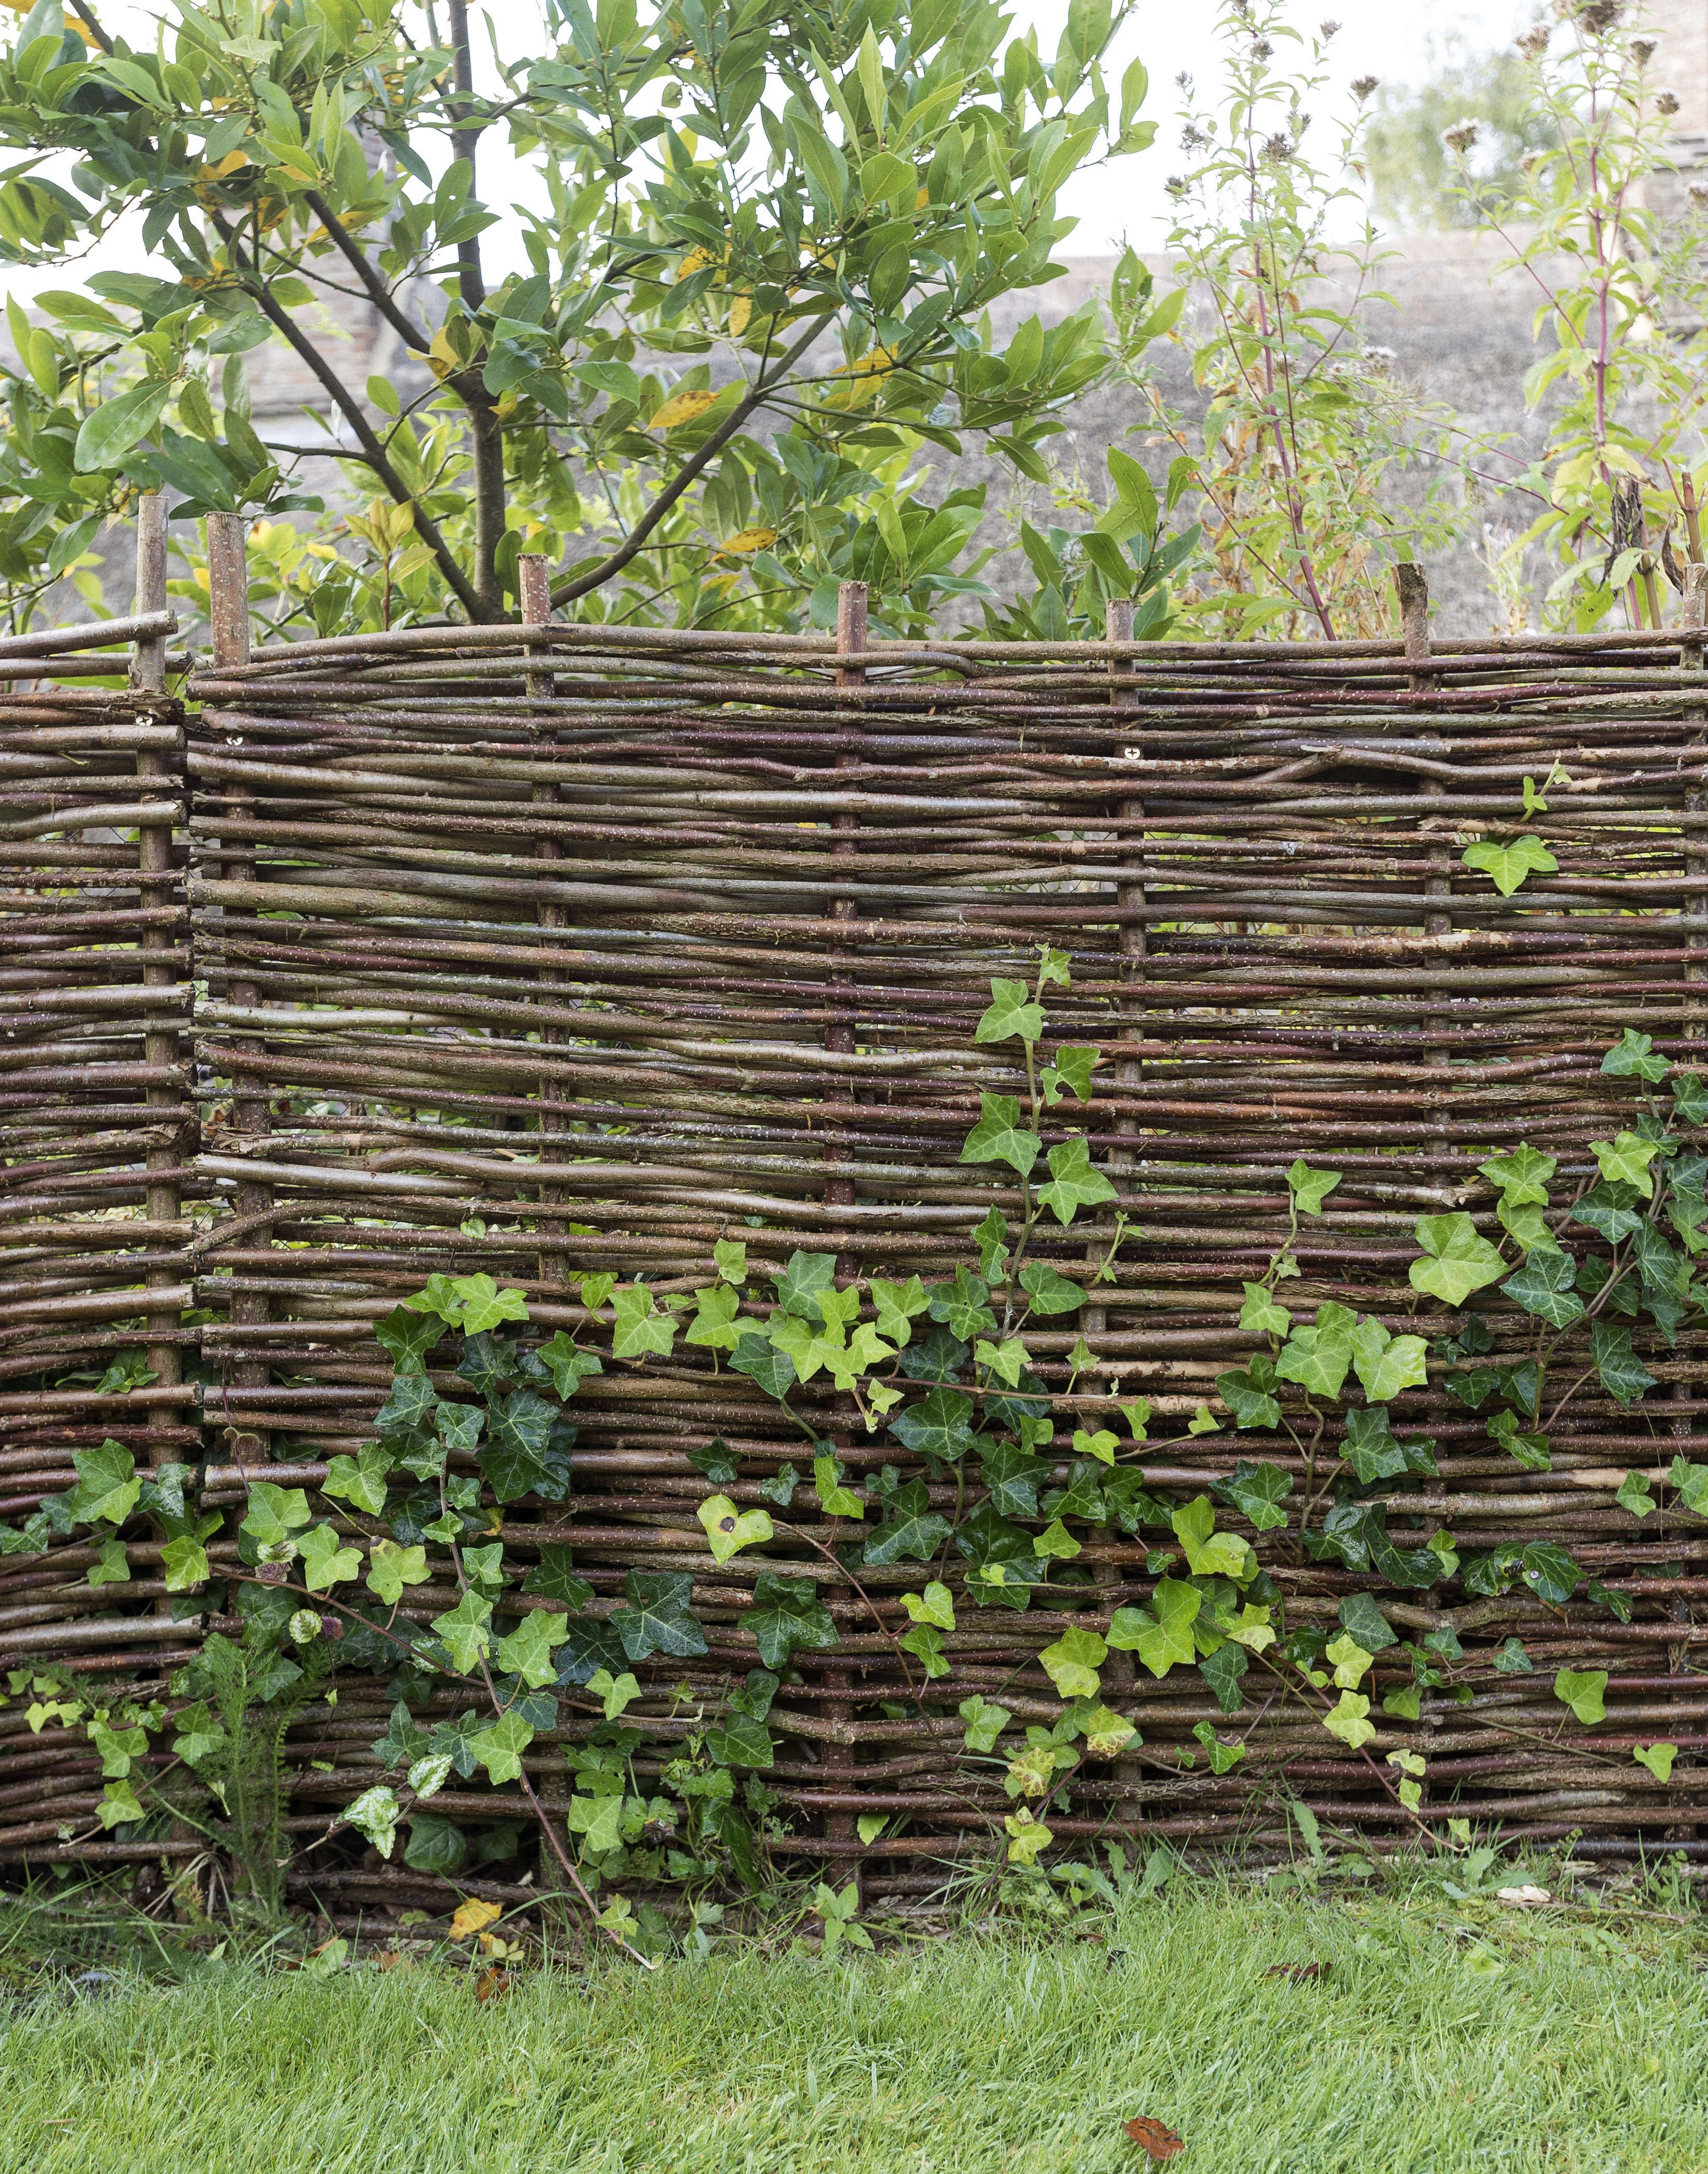 woven-fence-ben-pentreath-matthew-williamsdsc-6183